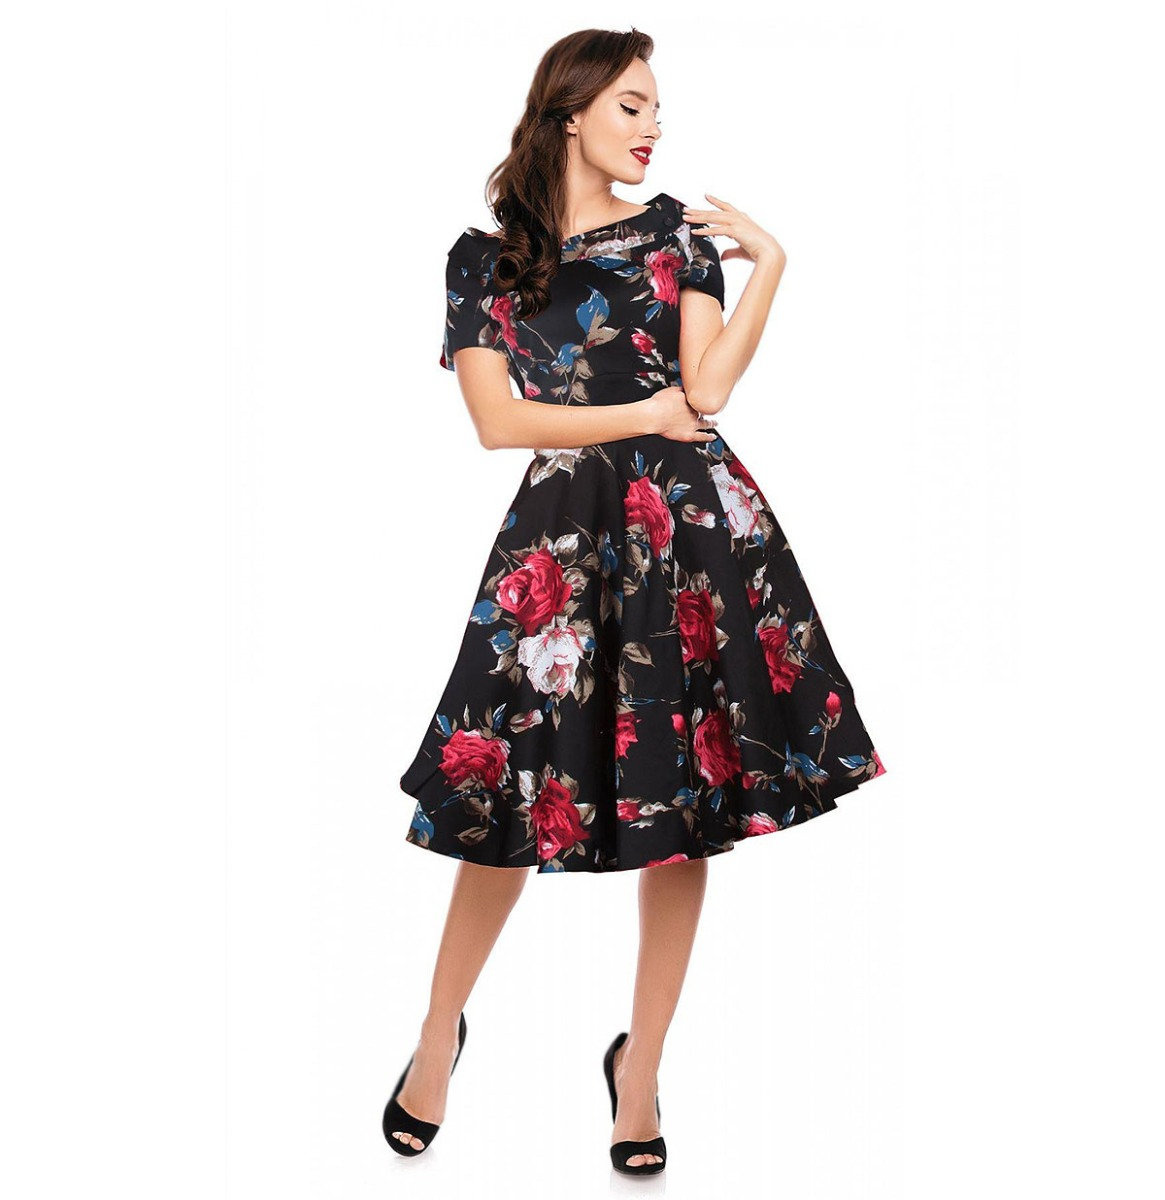 Darlene Retro Floral Roses Swing Dress Black